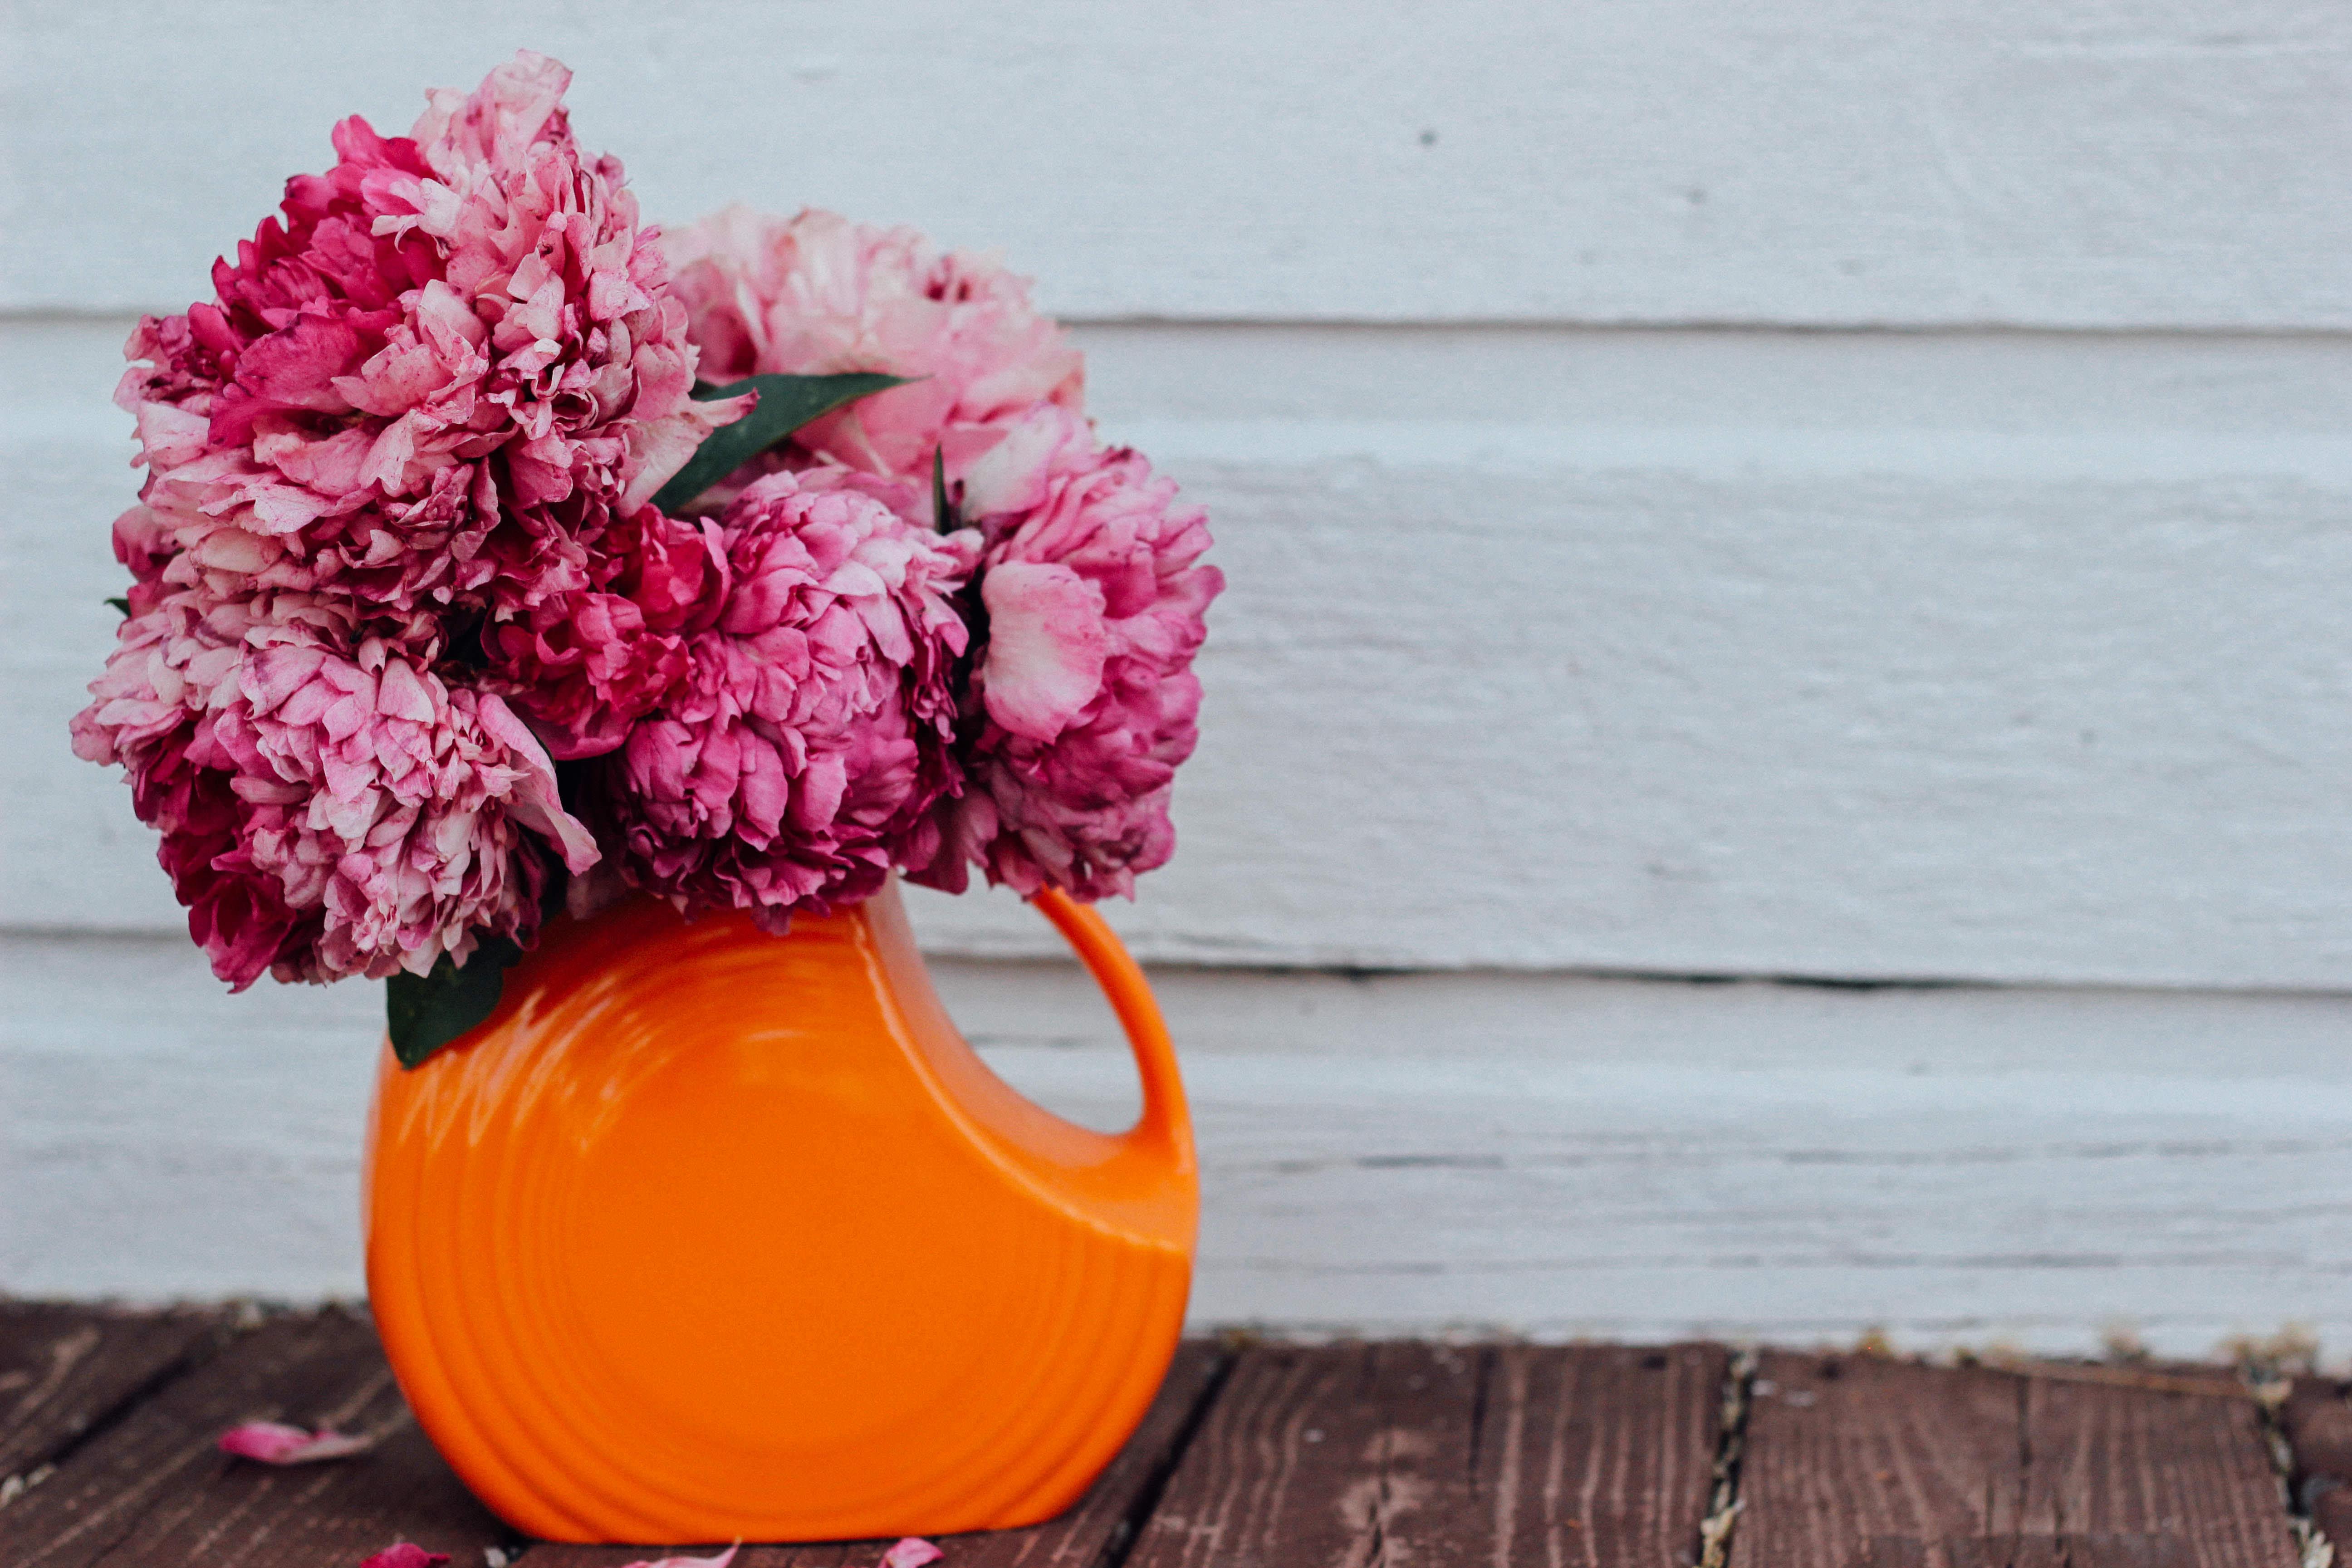 Free Images Blossom Texture Petal Bloom Rustic Summer Vase